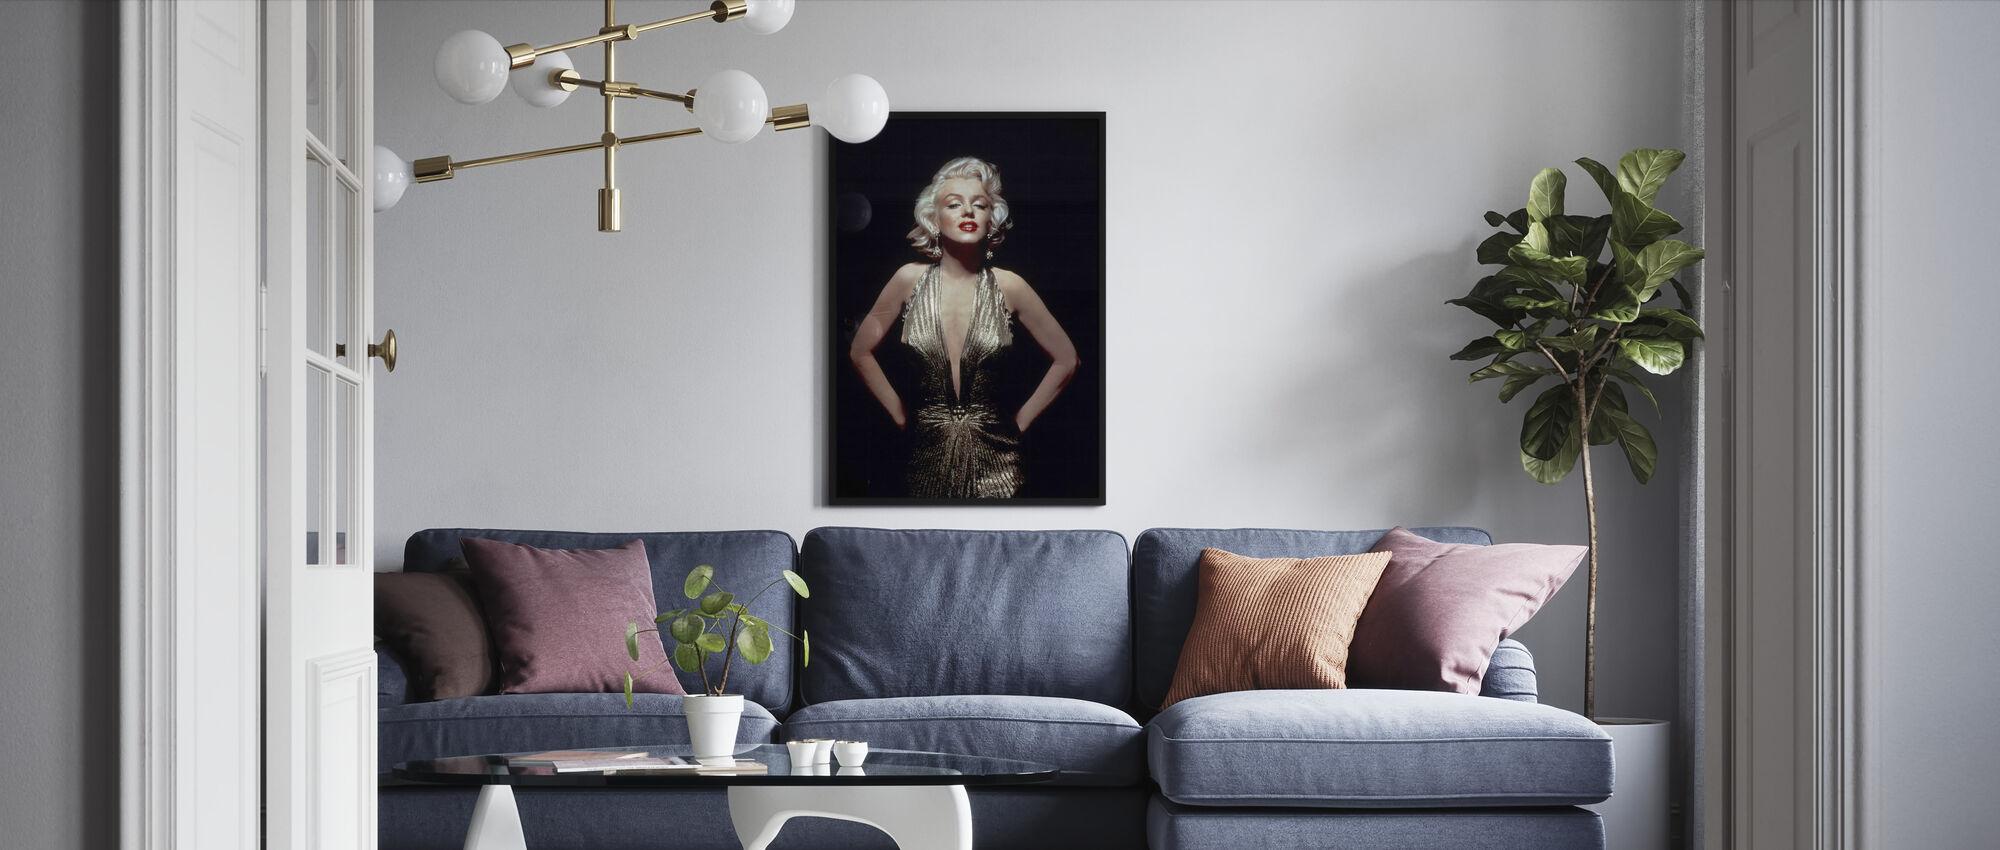 Marilyn Monroe in Gentlemen Prefer Blondes - Framed print - Living Room